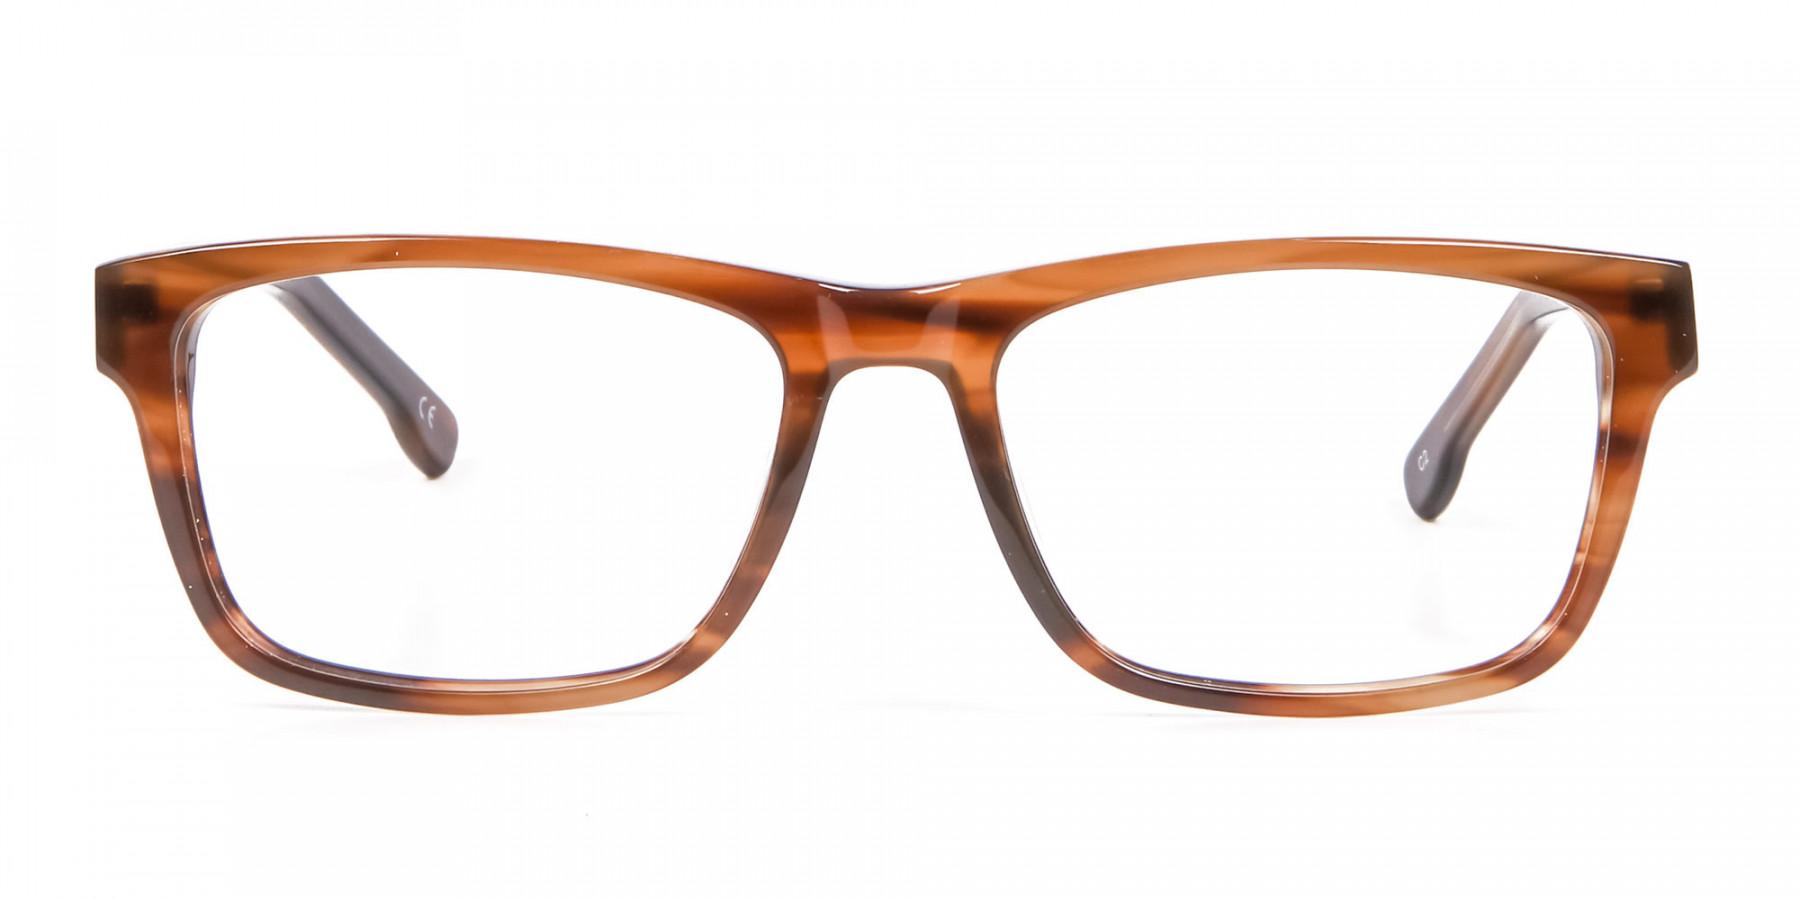 Wayfarer Shape Avant-Garde Sunglasses